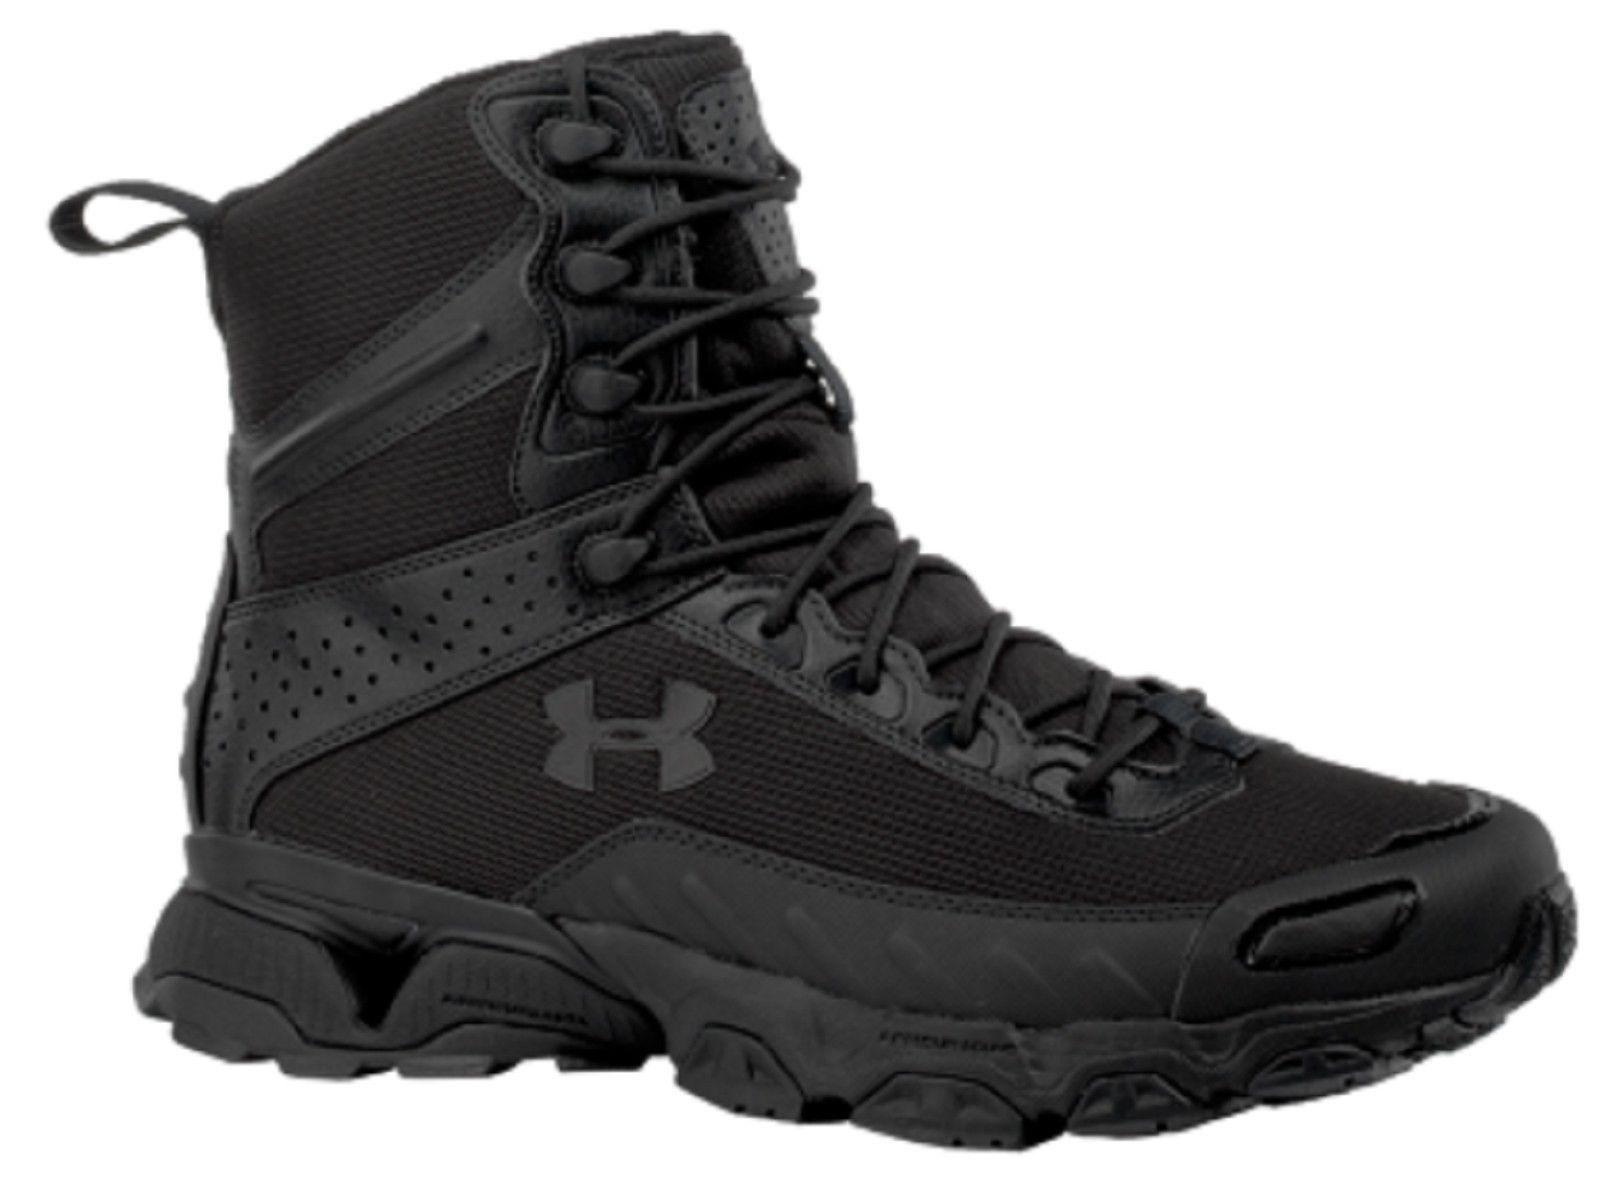 Hormiga Religioso agujero  Men's Under Armour Valsetz Military Boots - UA Lightweight ...